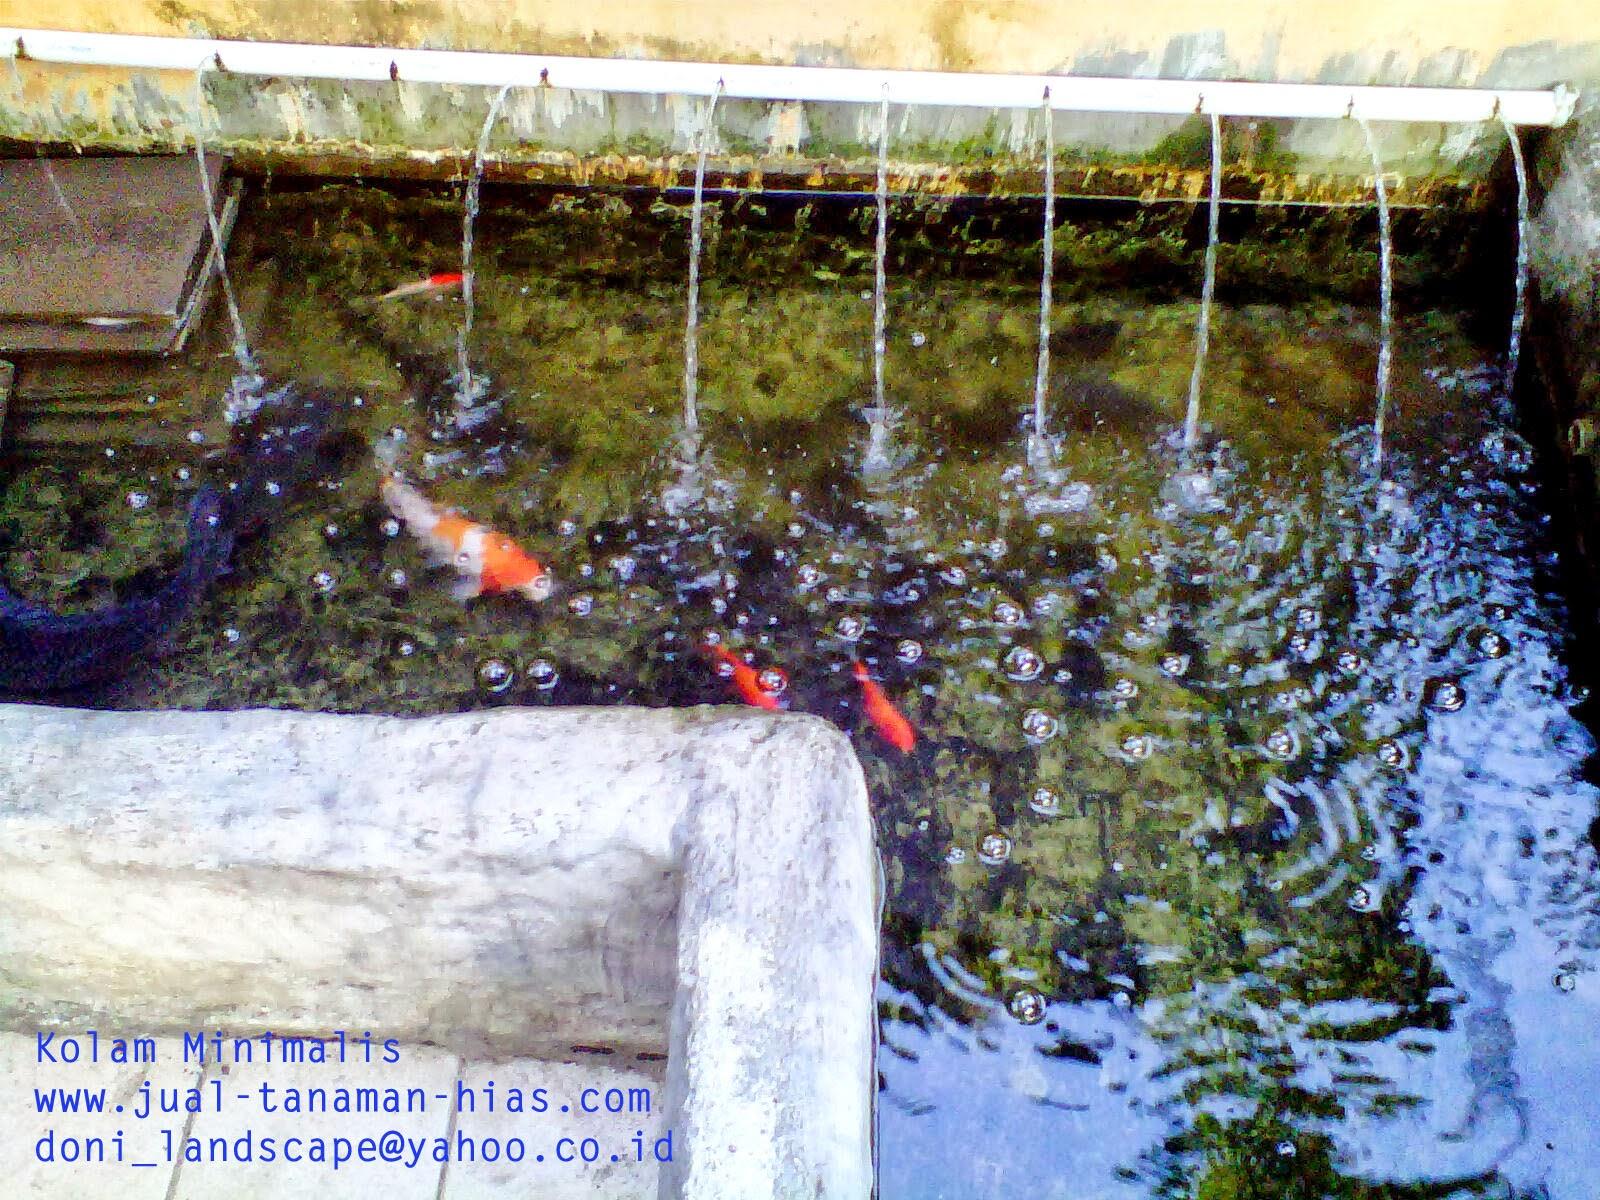 Tukang taman Bogor kota | tukang kolam Minimalis Jabodetabek | kolam air mancur | kolam hias bogor